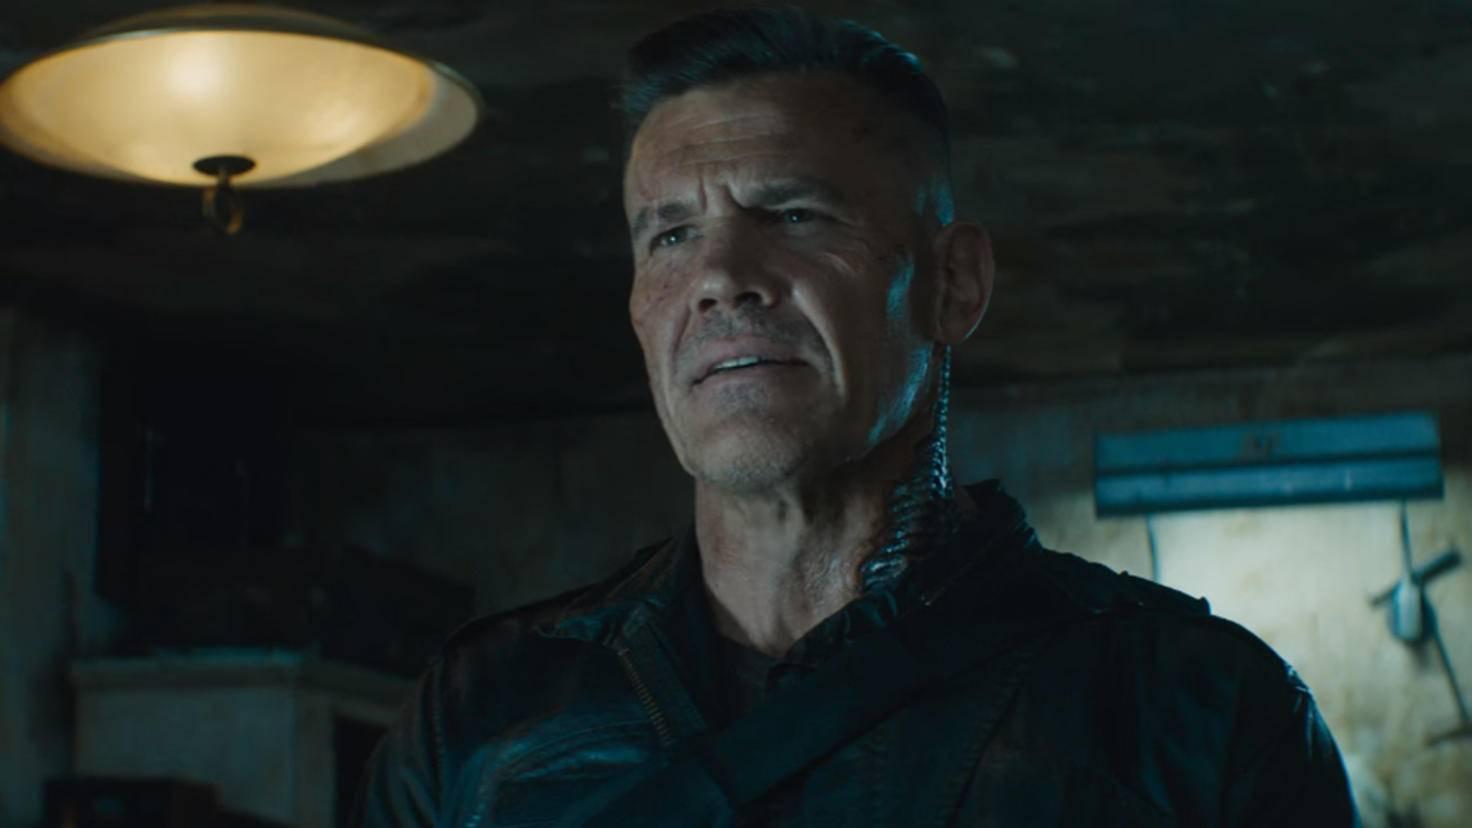 Josh Brolin Cable Deadpool 2 YouTube 20th Century Fox